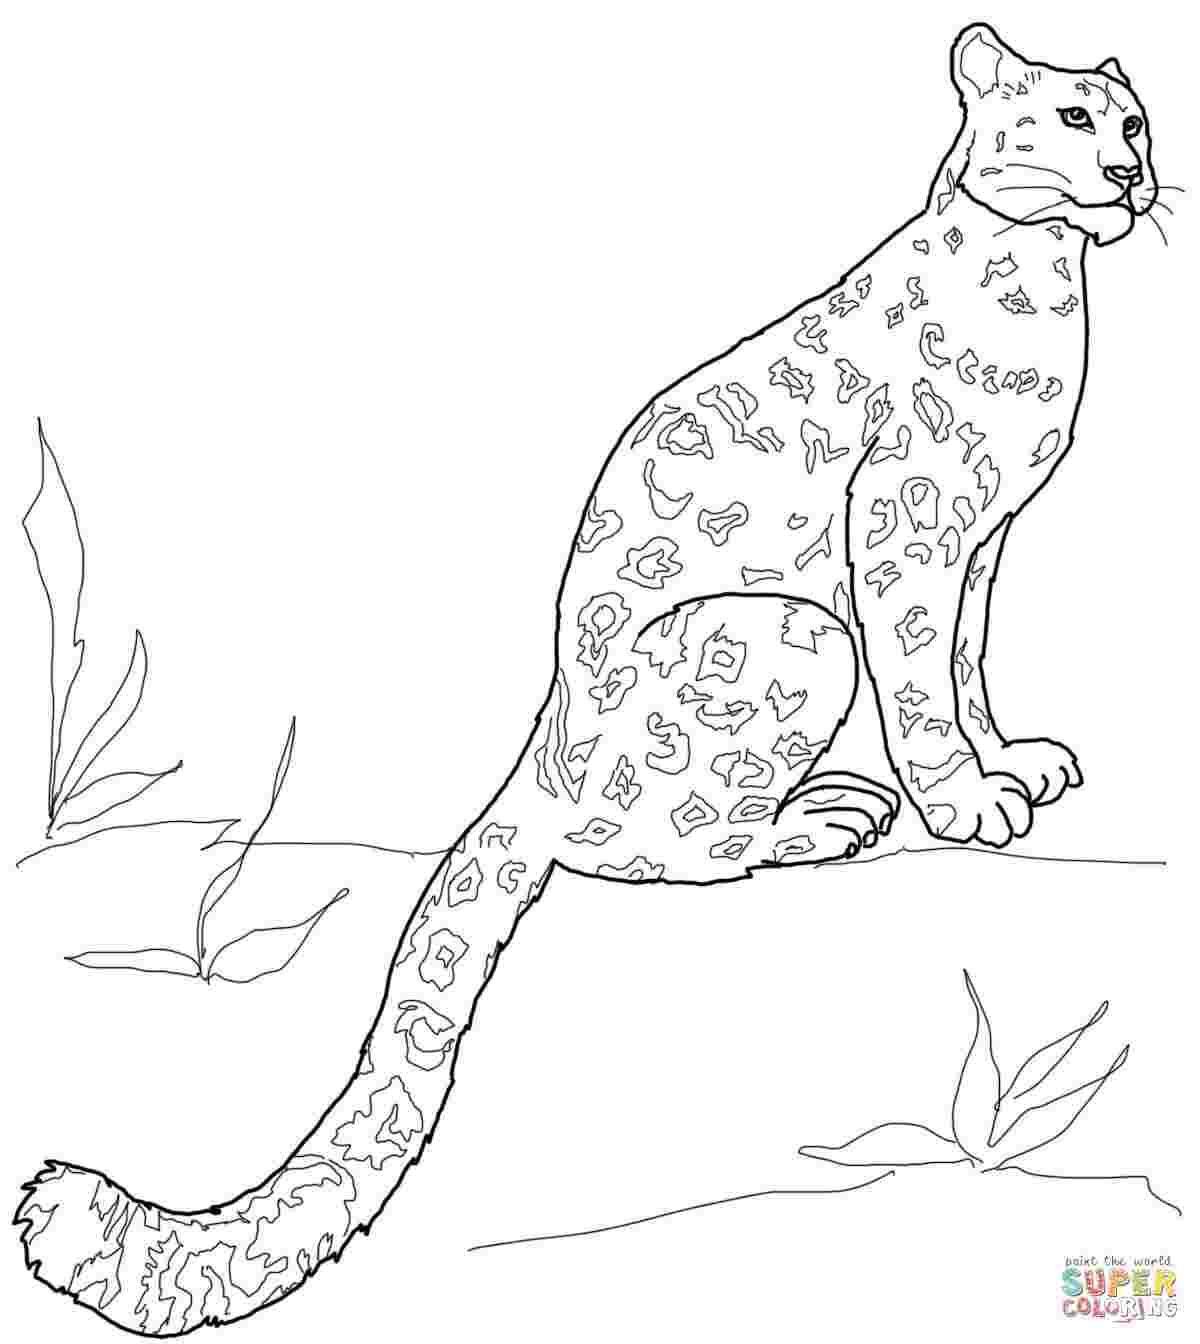 Coloring Pages Snow Leopard Coloringpages Coloringpageschristmas